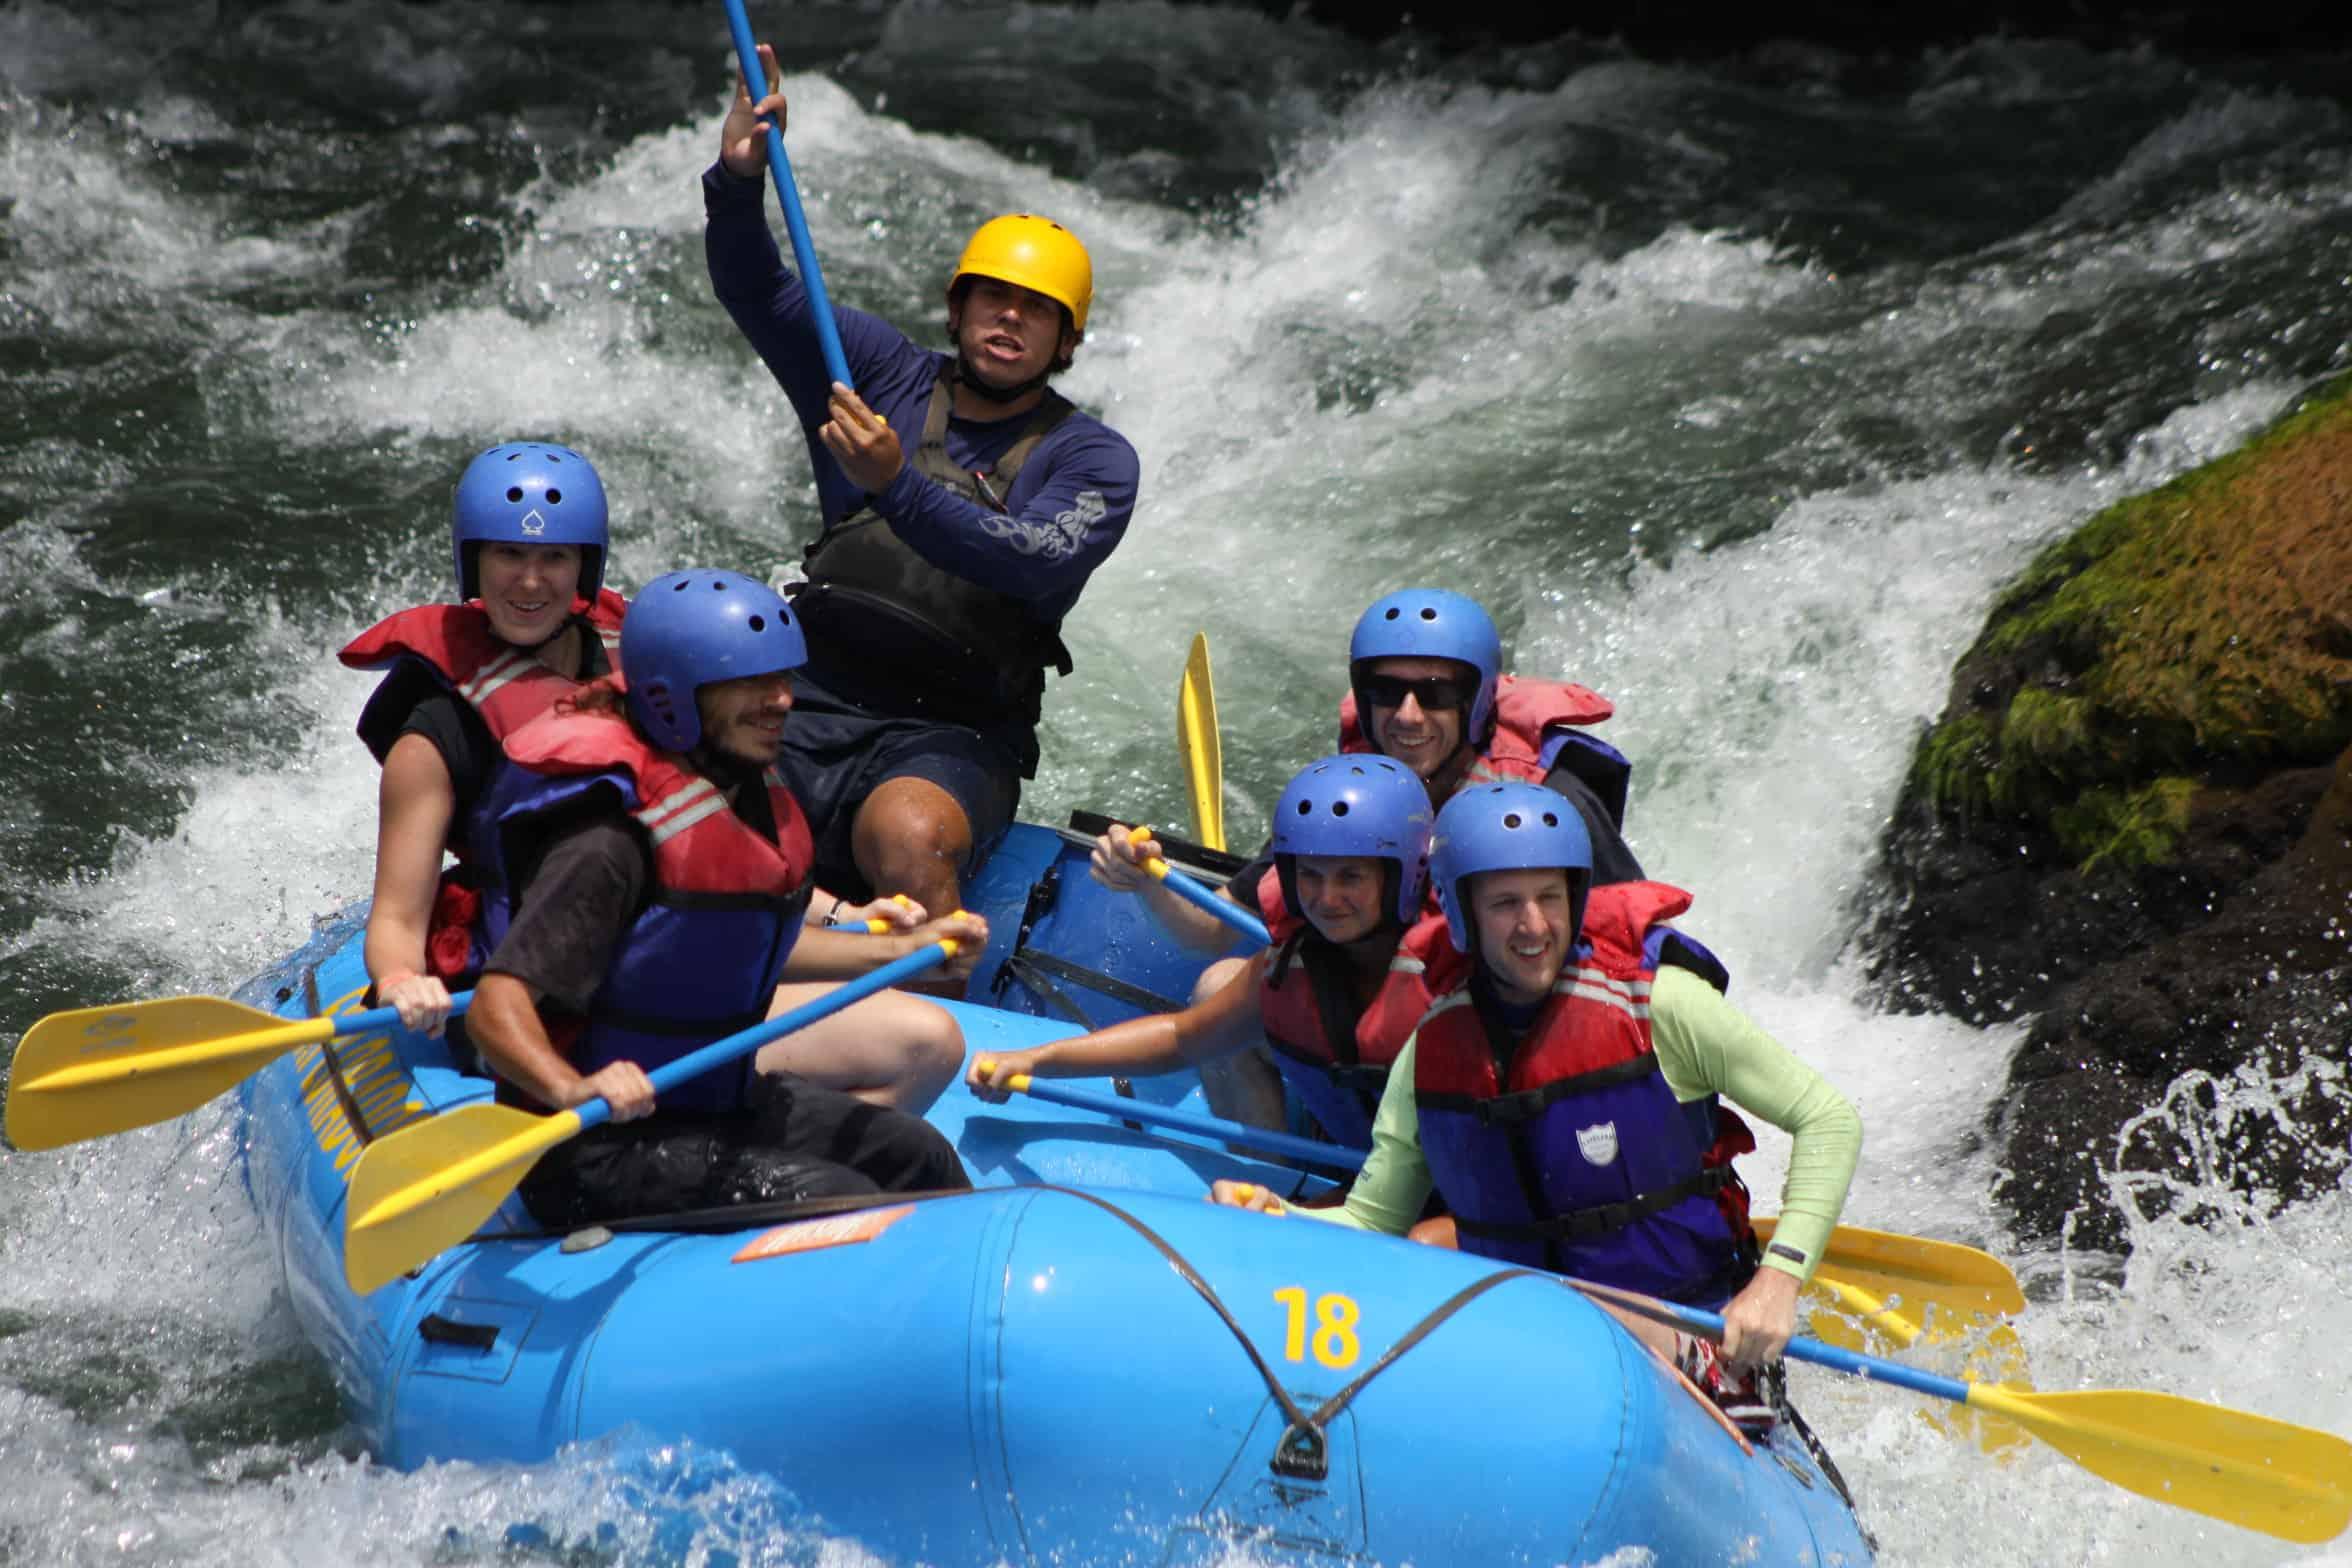 Rafting Rio Pacuare, Costa Rica